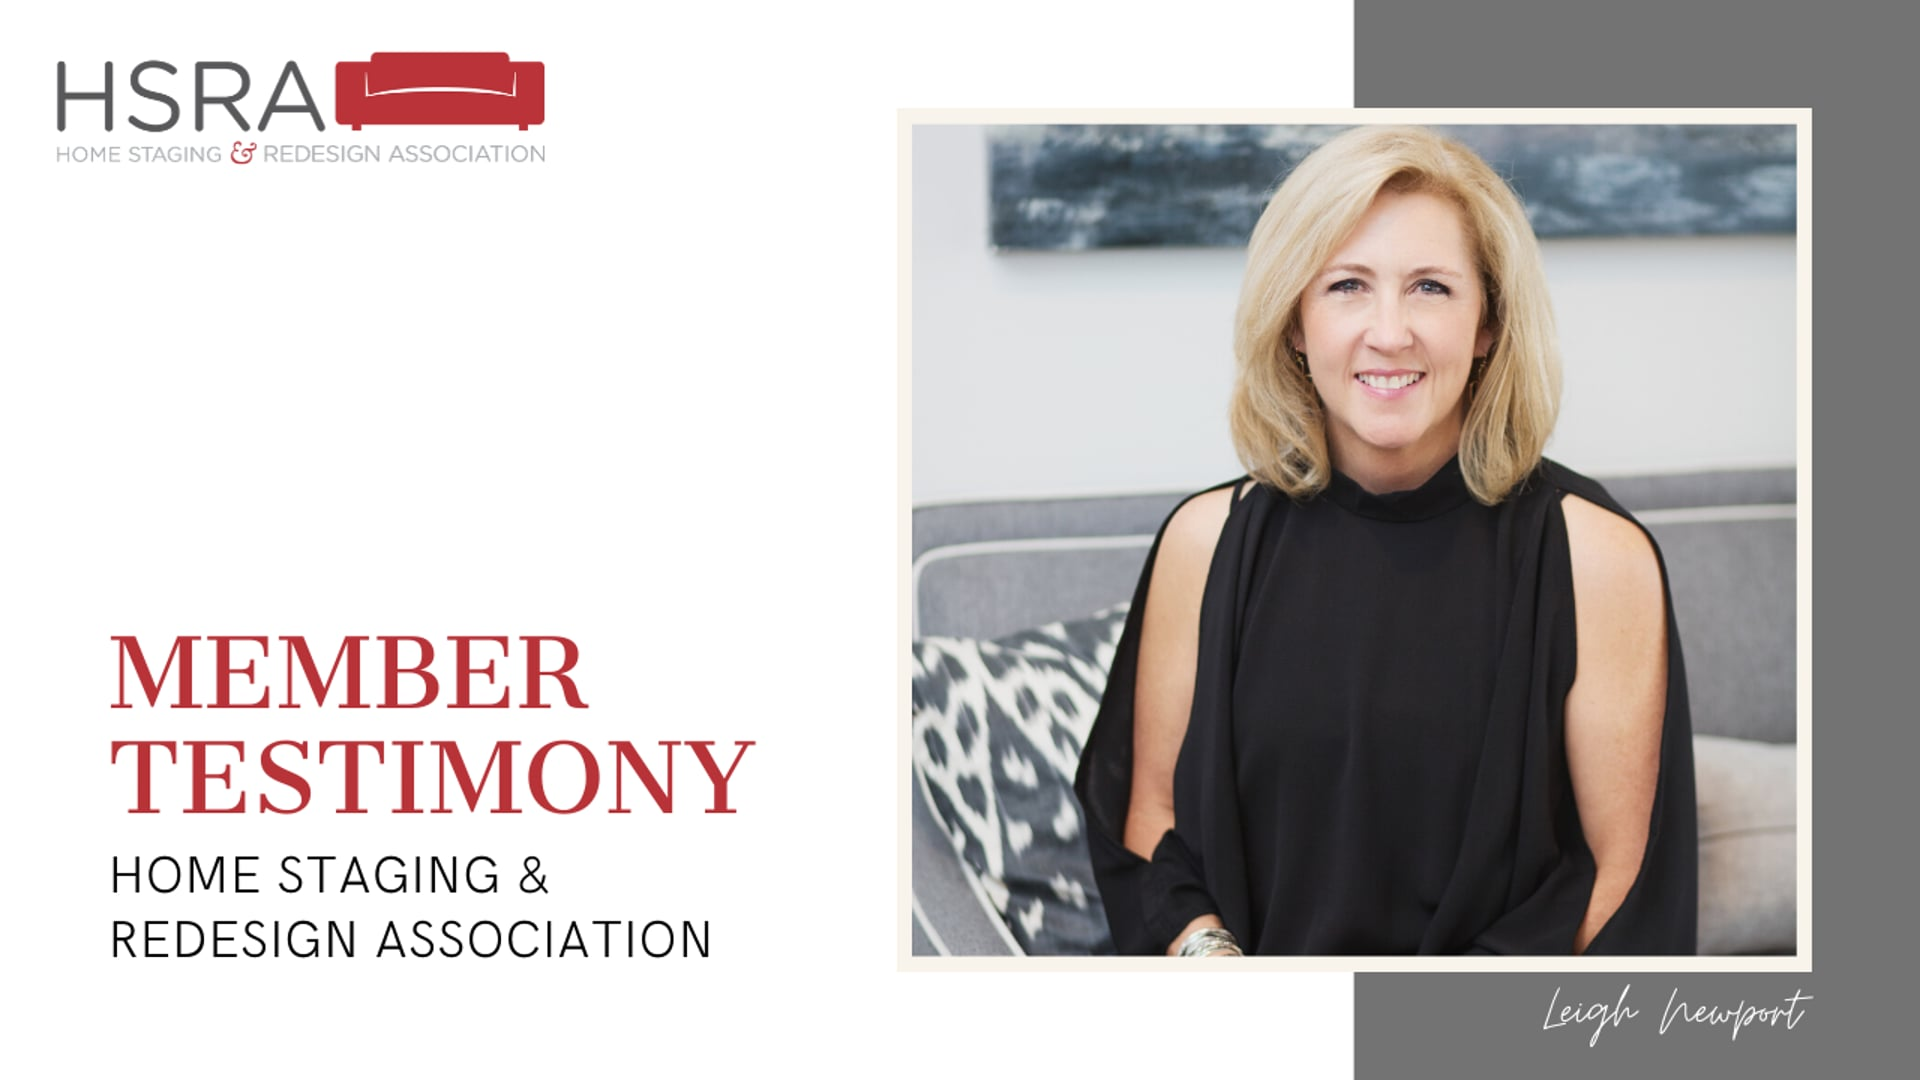 HSRA Member Testimony 2020 Leigh Newport